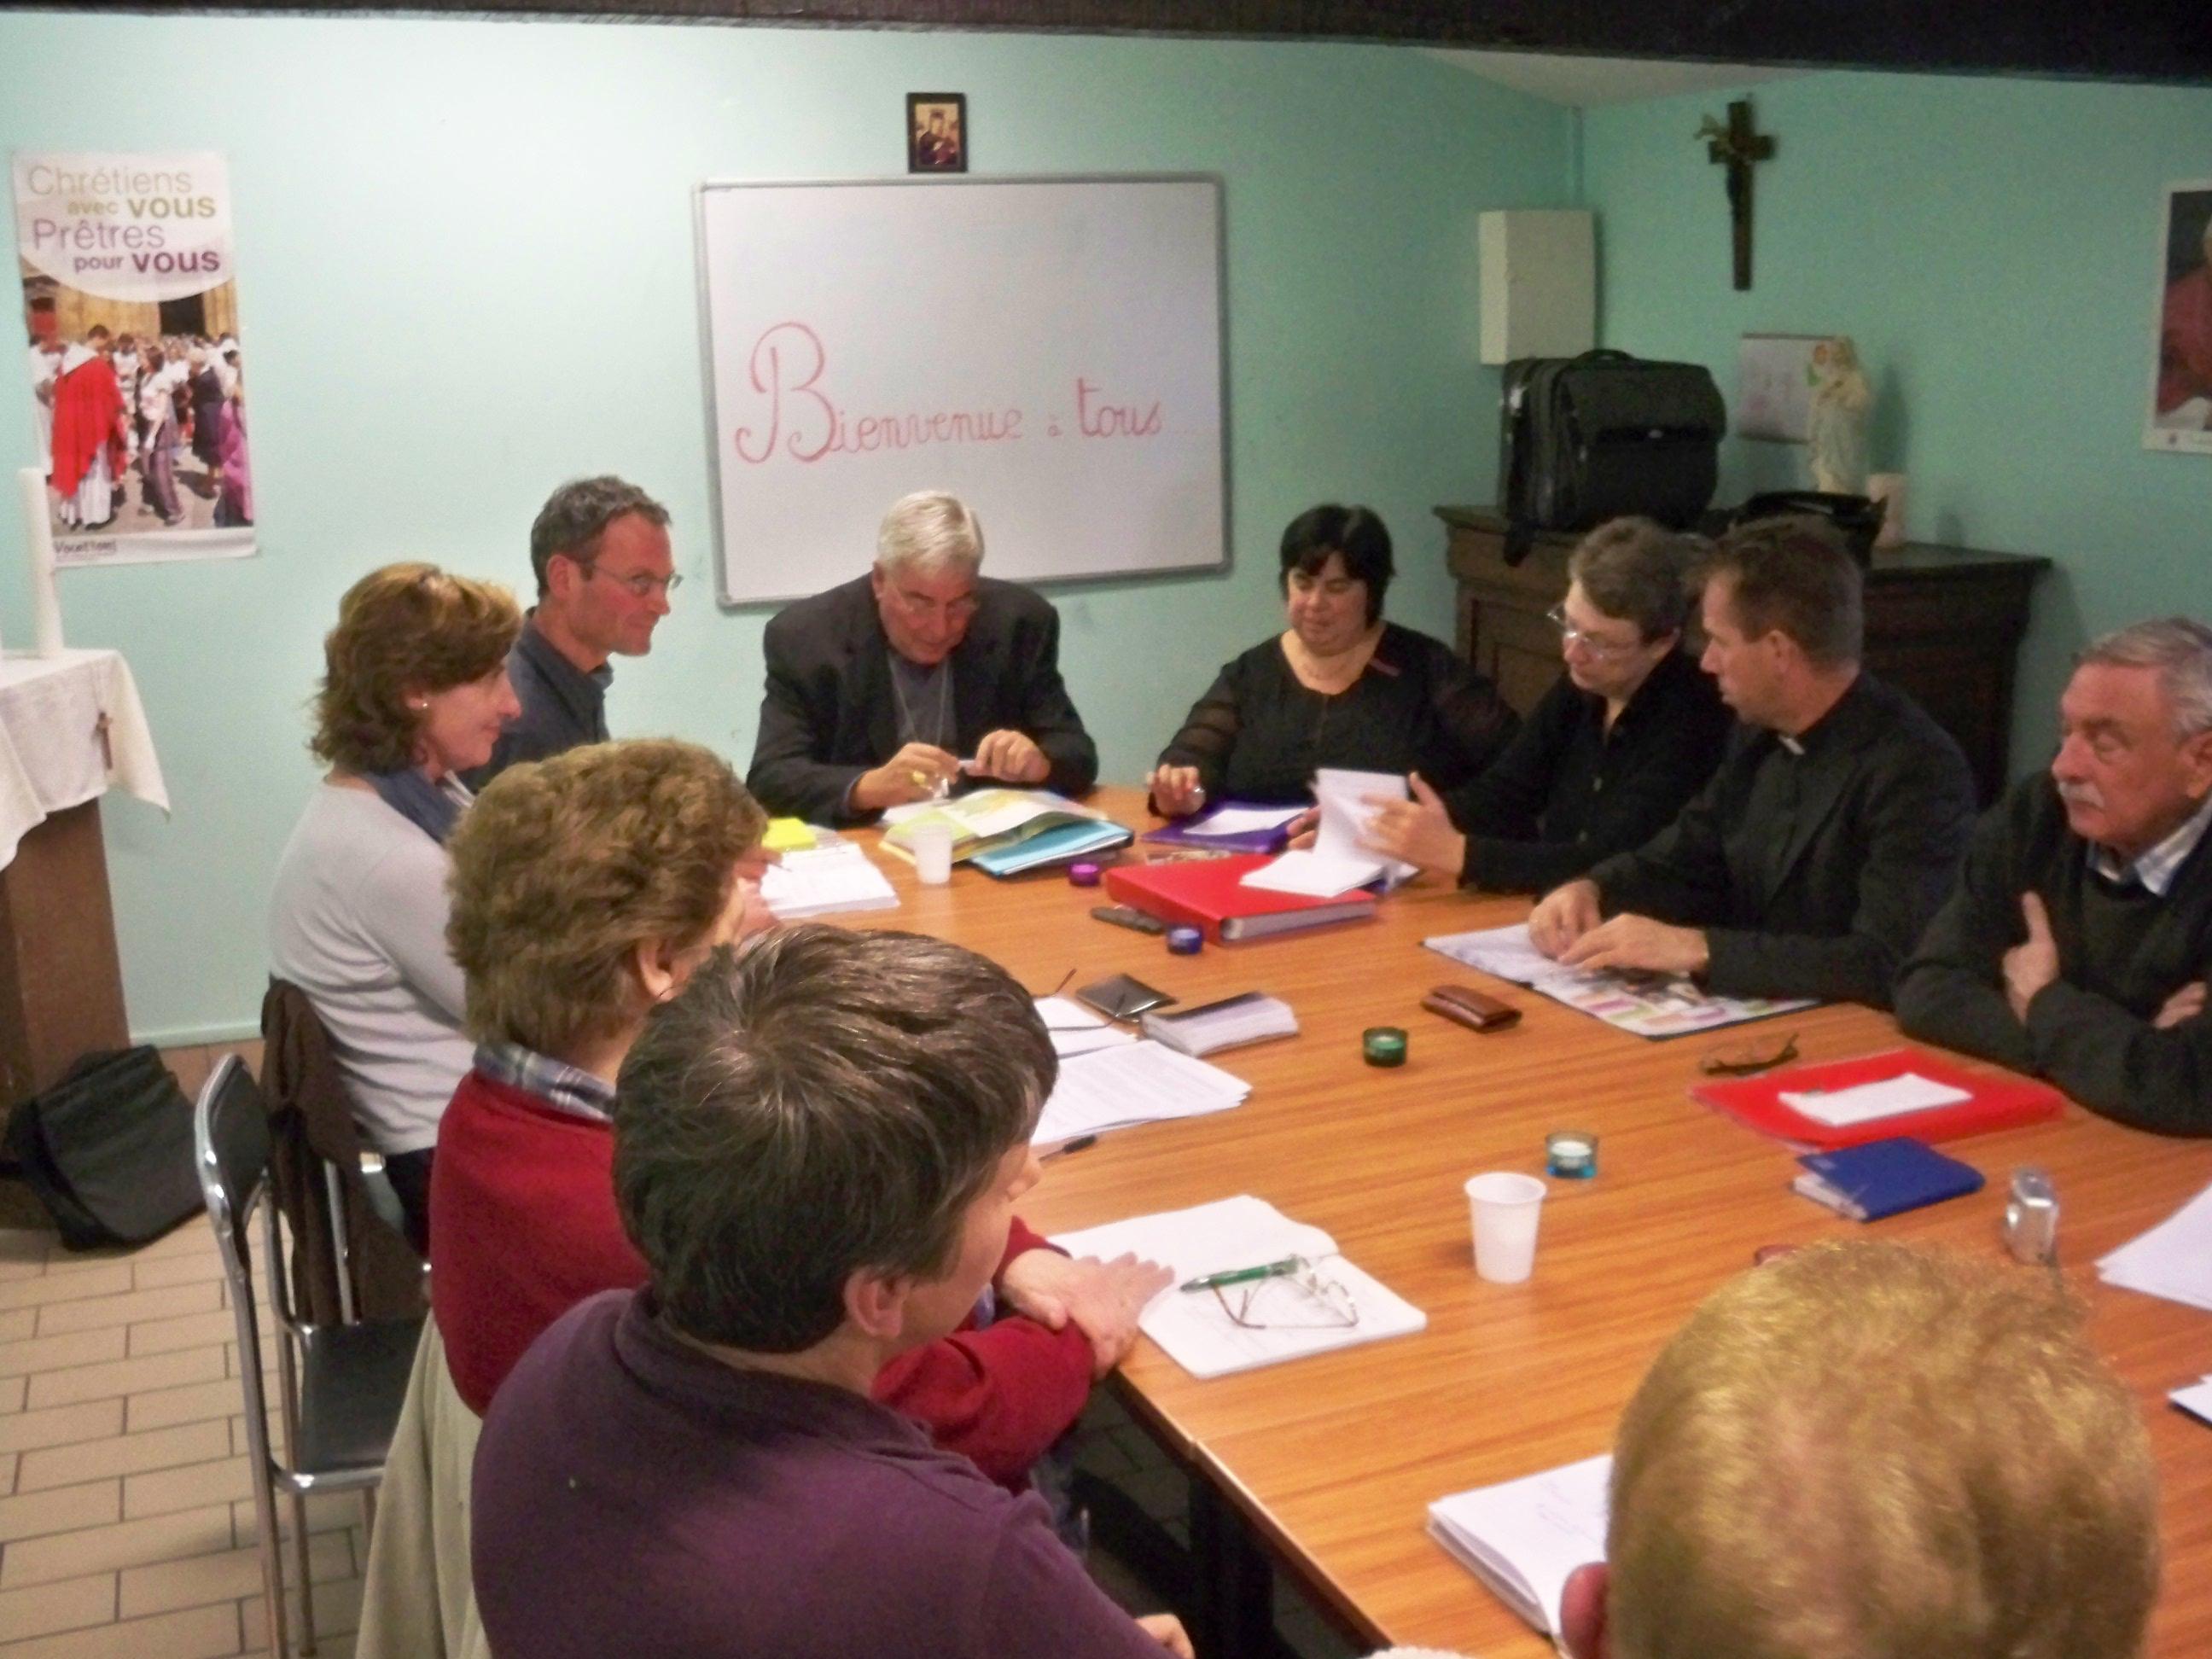 visite pastorale 1er jour 002